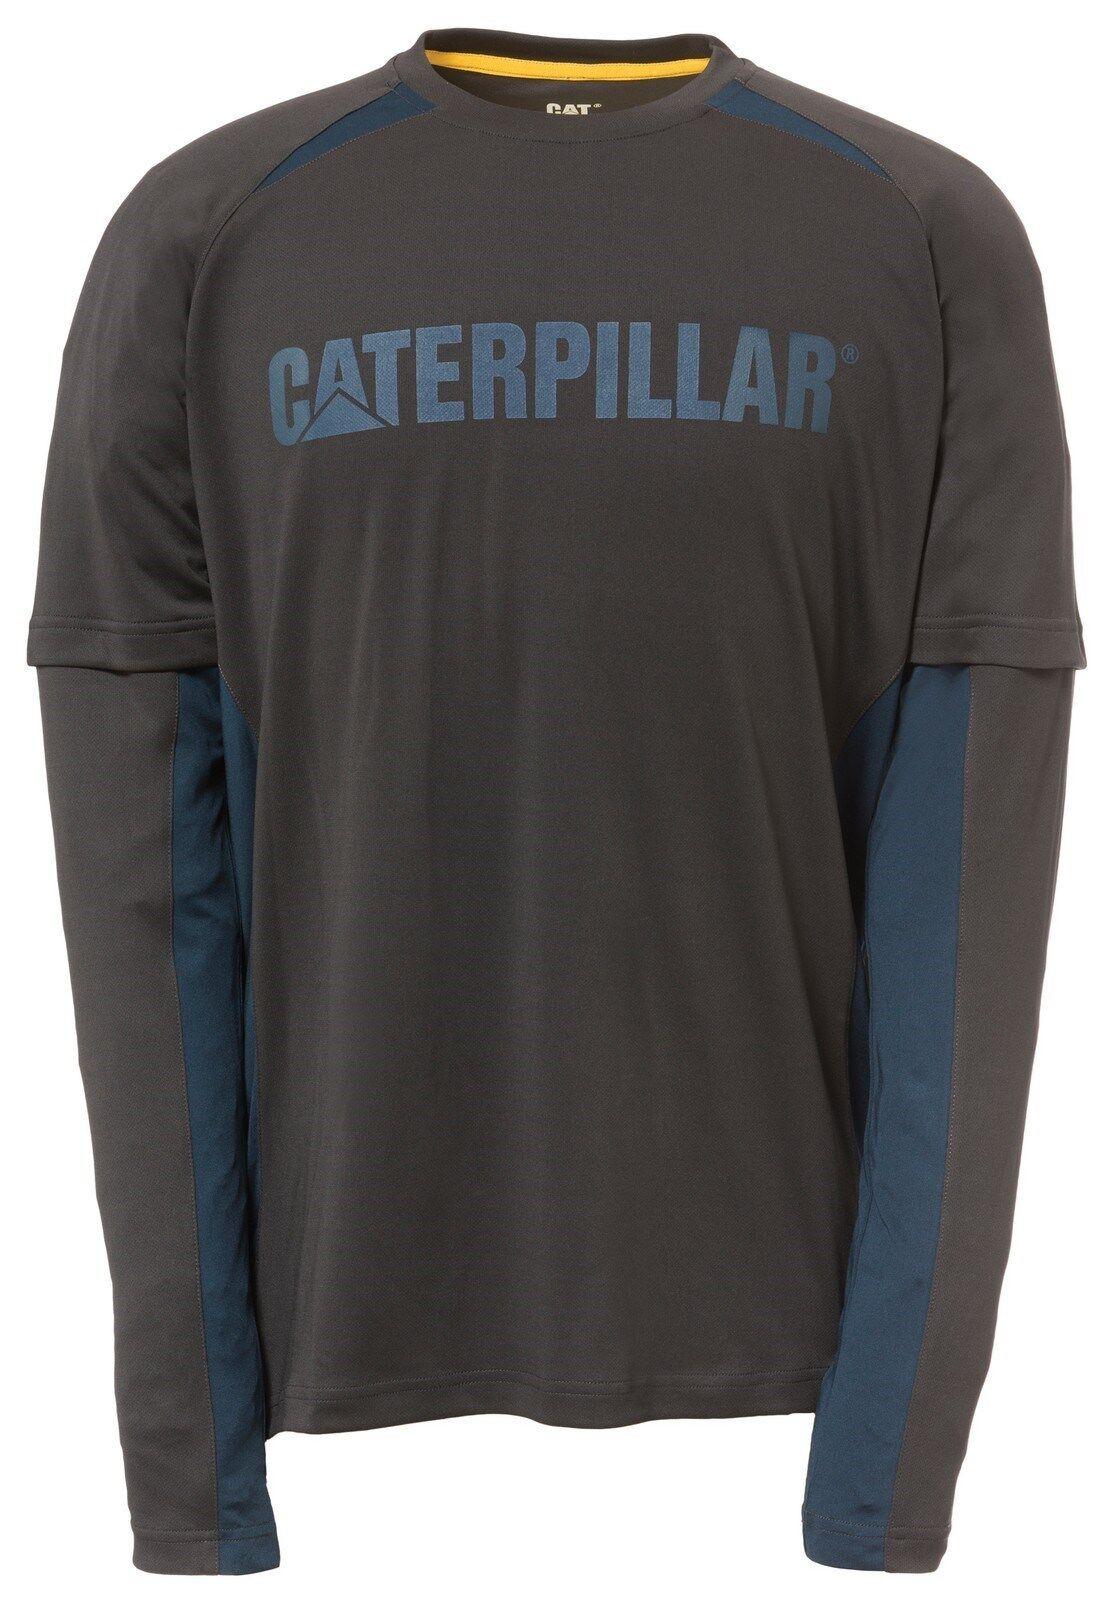 CAT Caterpillar SPEDIZIONE maniche lunghe t-shirt uomo durevole durevole durevole lavoro Maglietta eca448